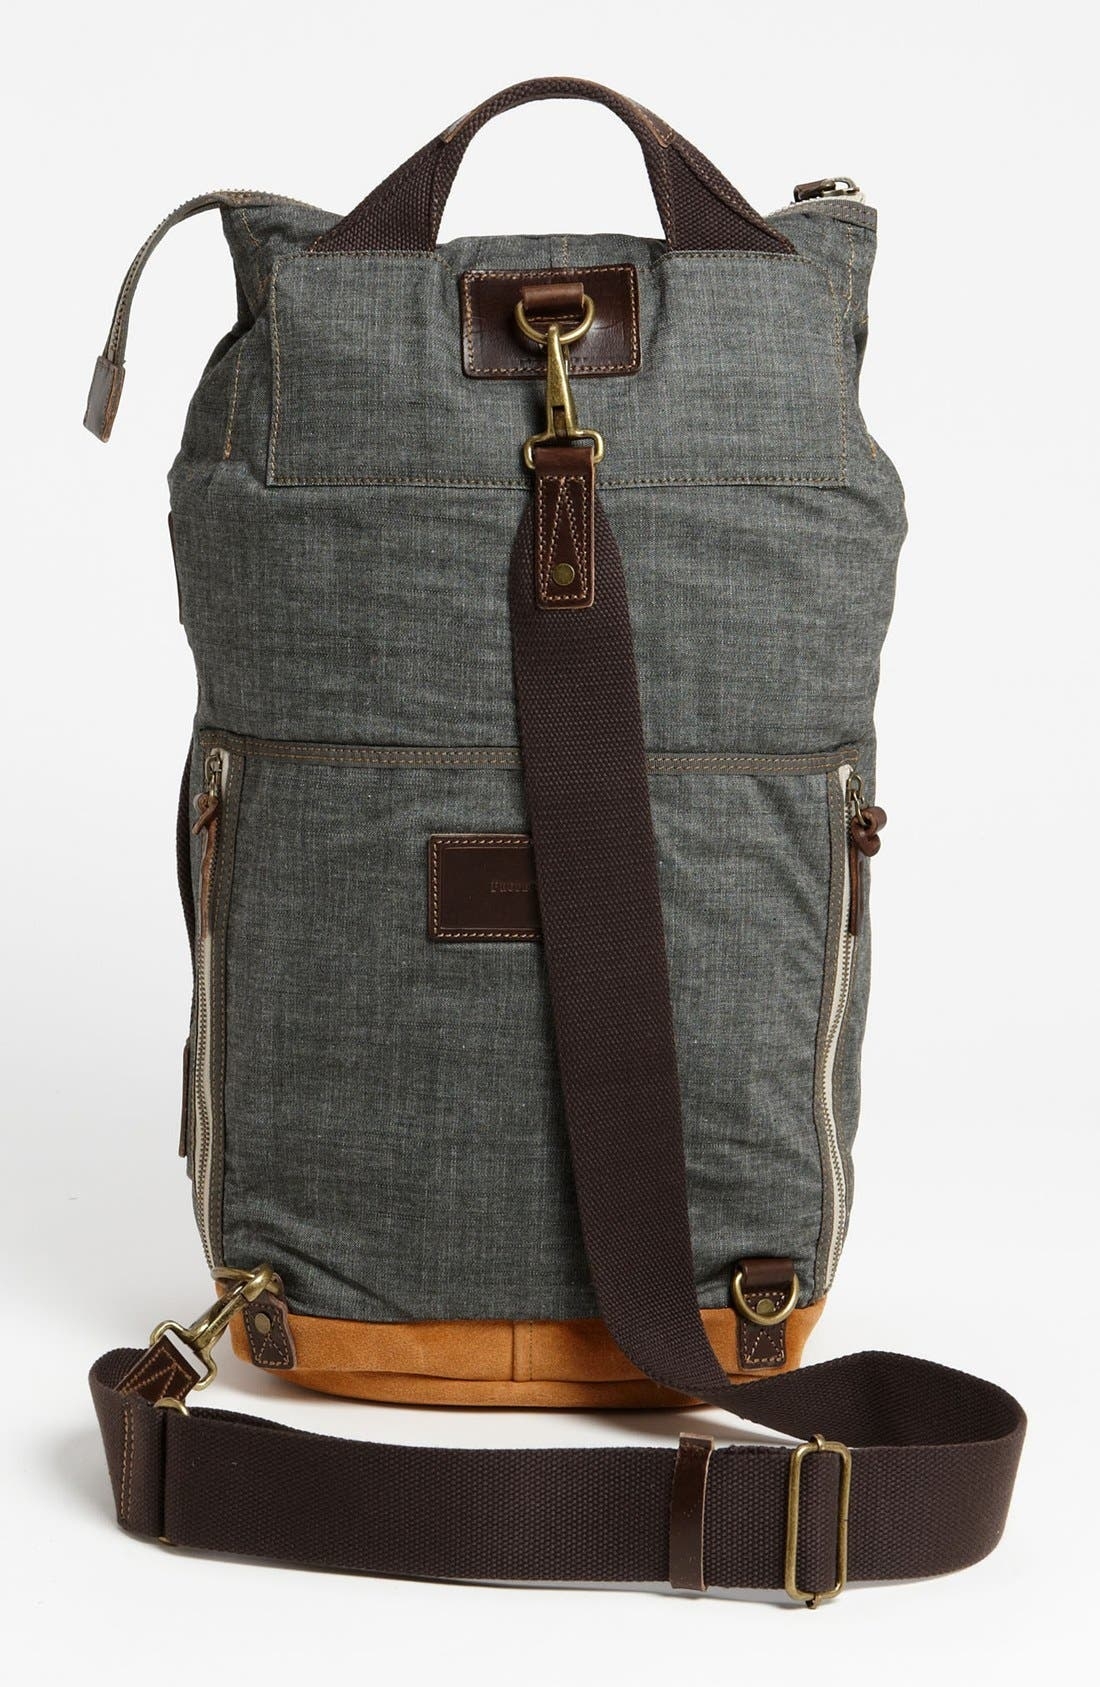 Alternate Image 1 Selected - Property Of... 'Carter Ranger' Duffel Bag